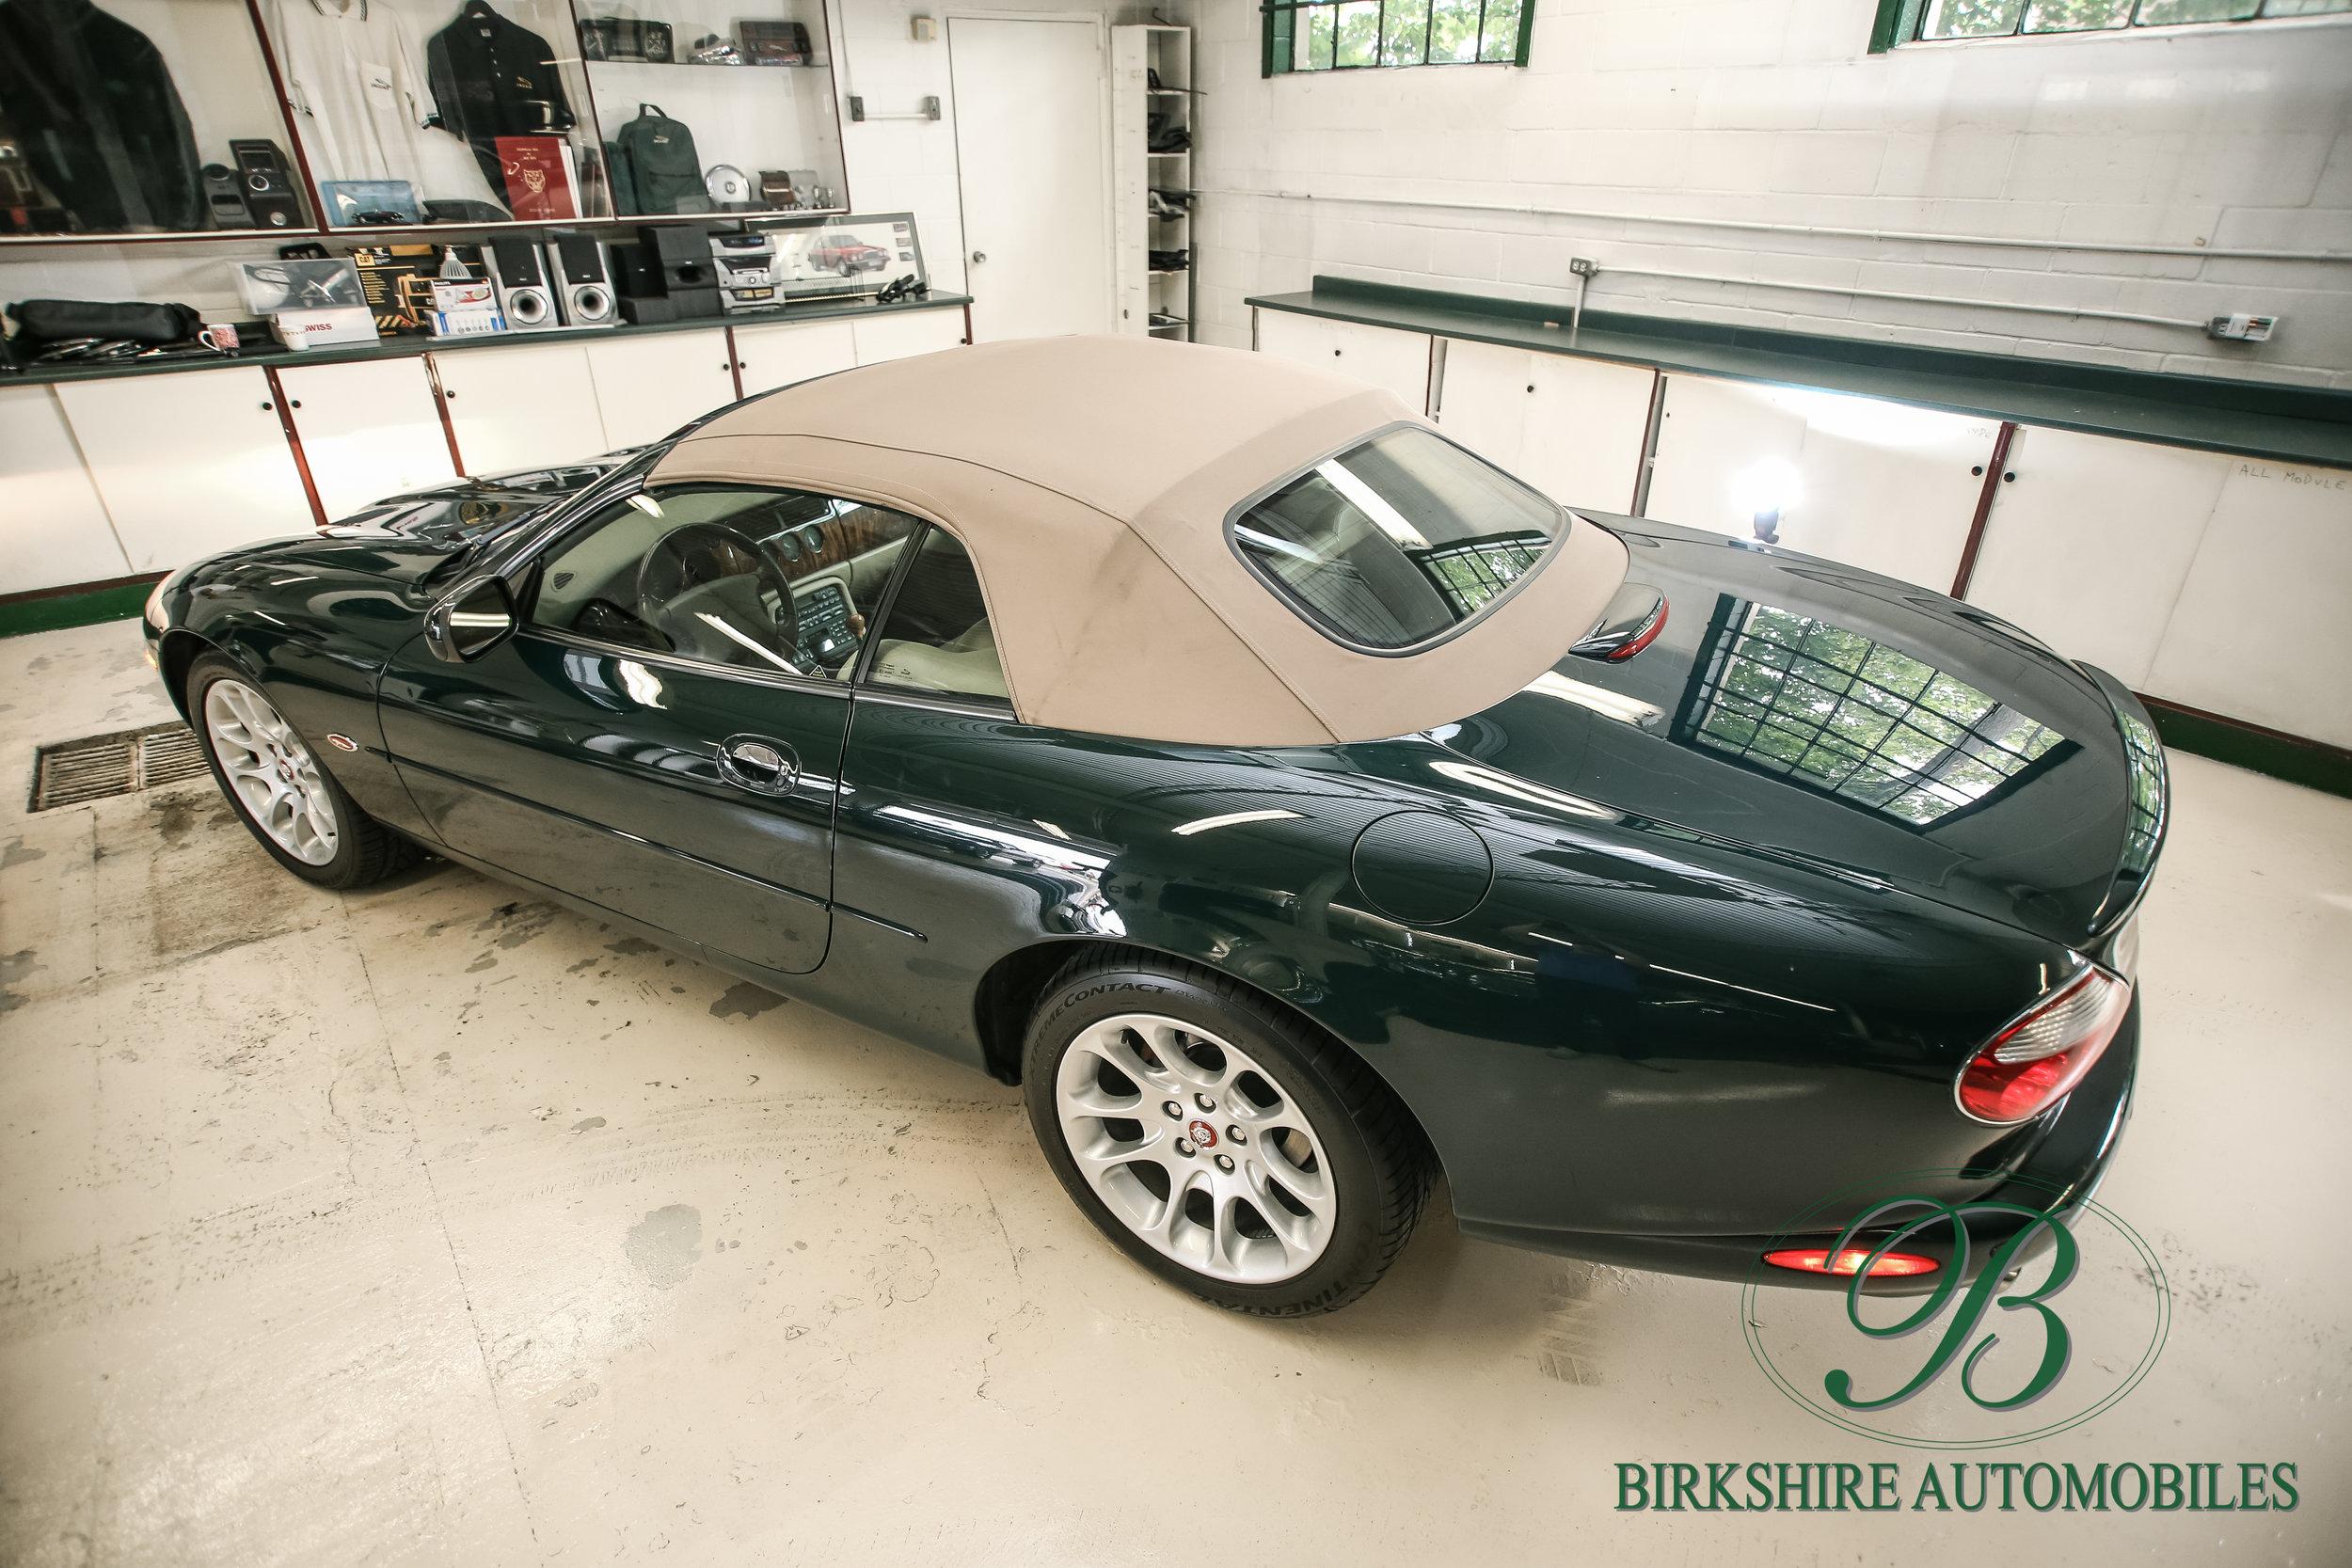 Birkshire Automobiles-2001 Jaguar XKR Convertible (24).jpg